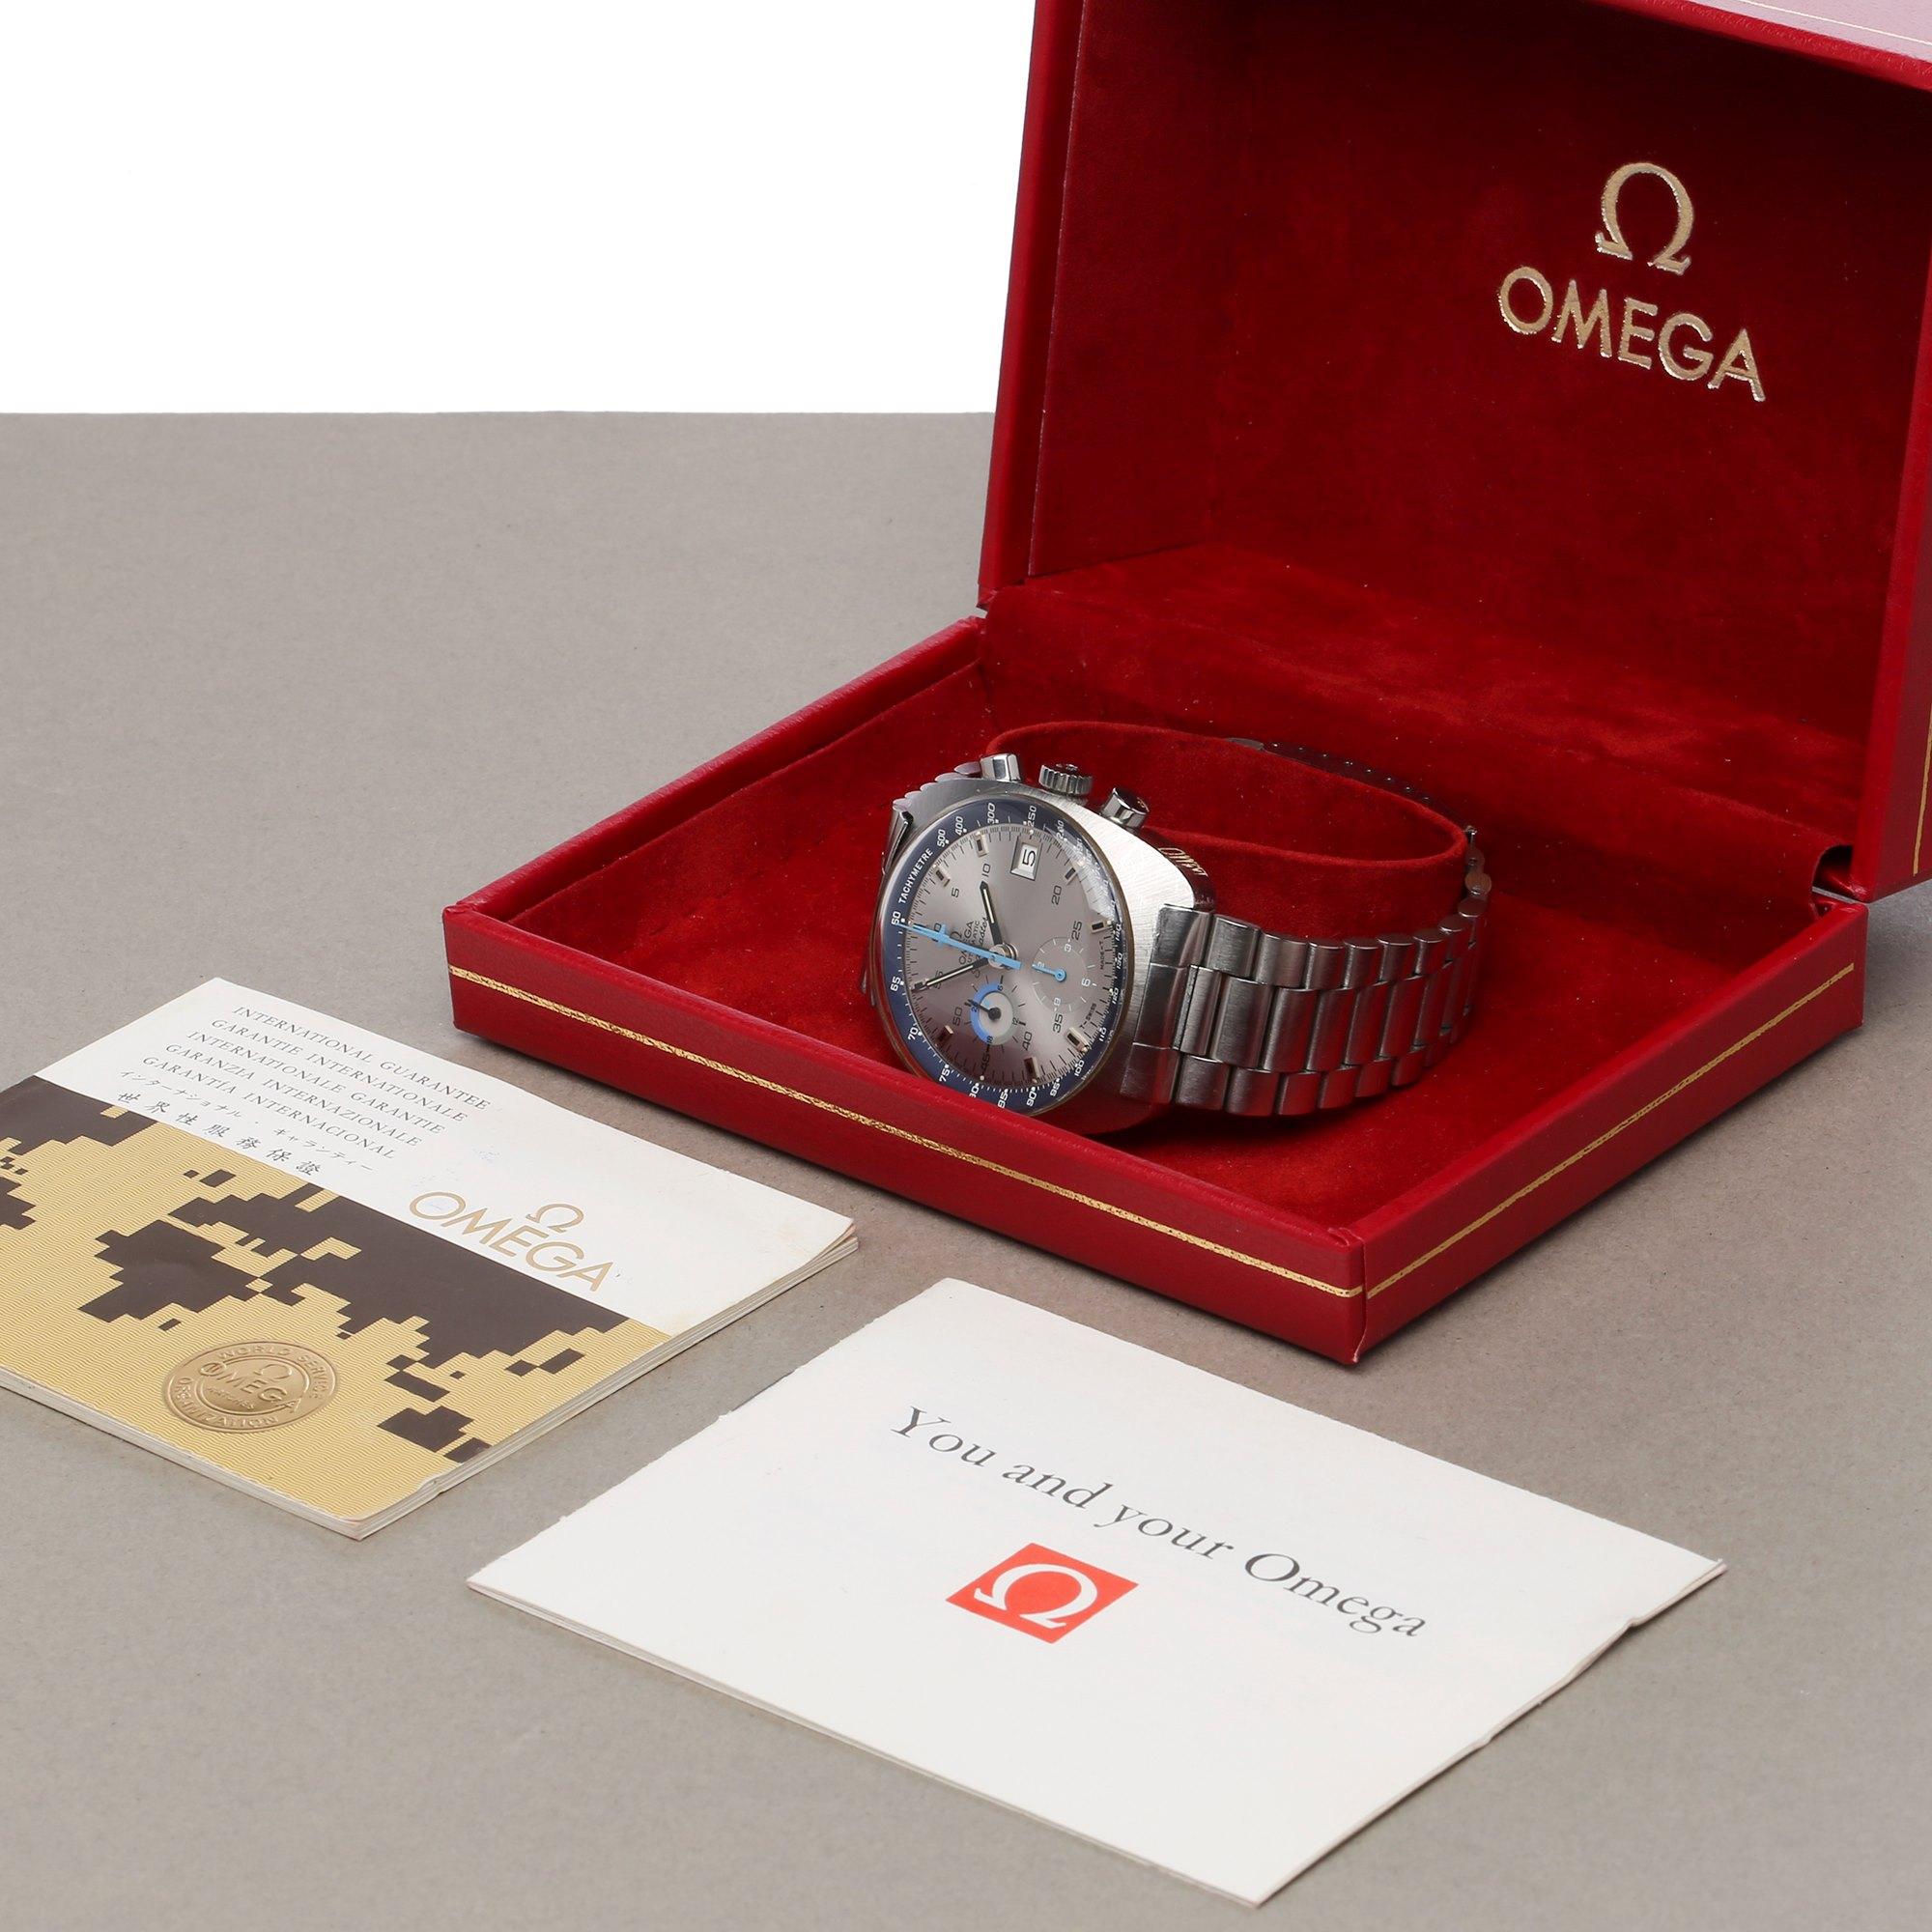 Omega Seamaster Chronograaf Roestvrij Staal 167.007